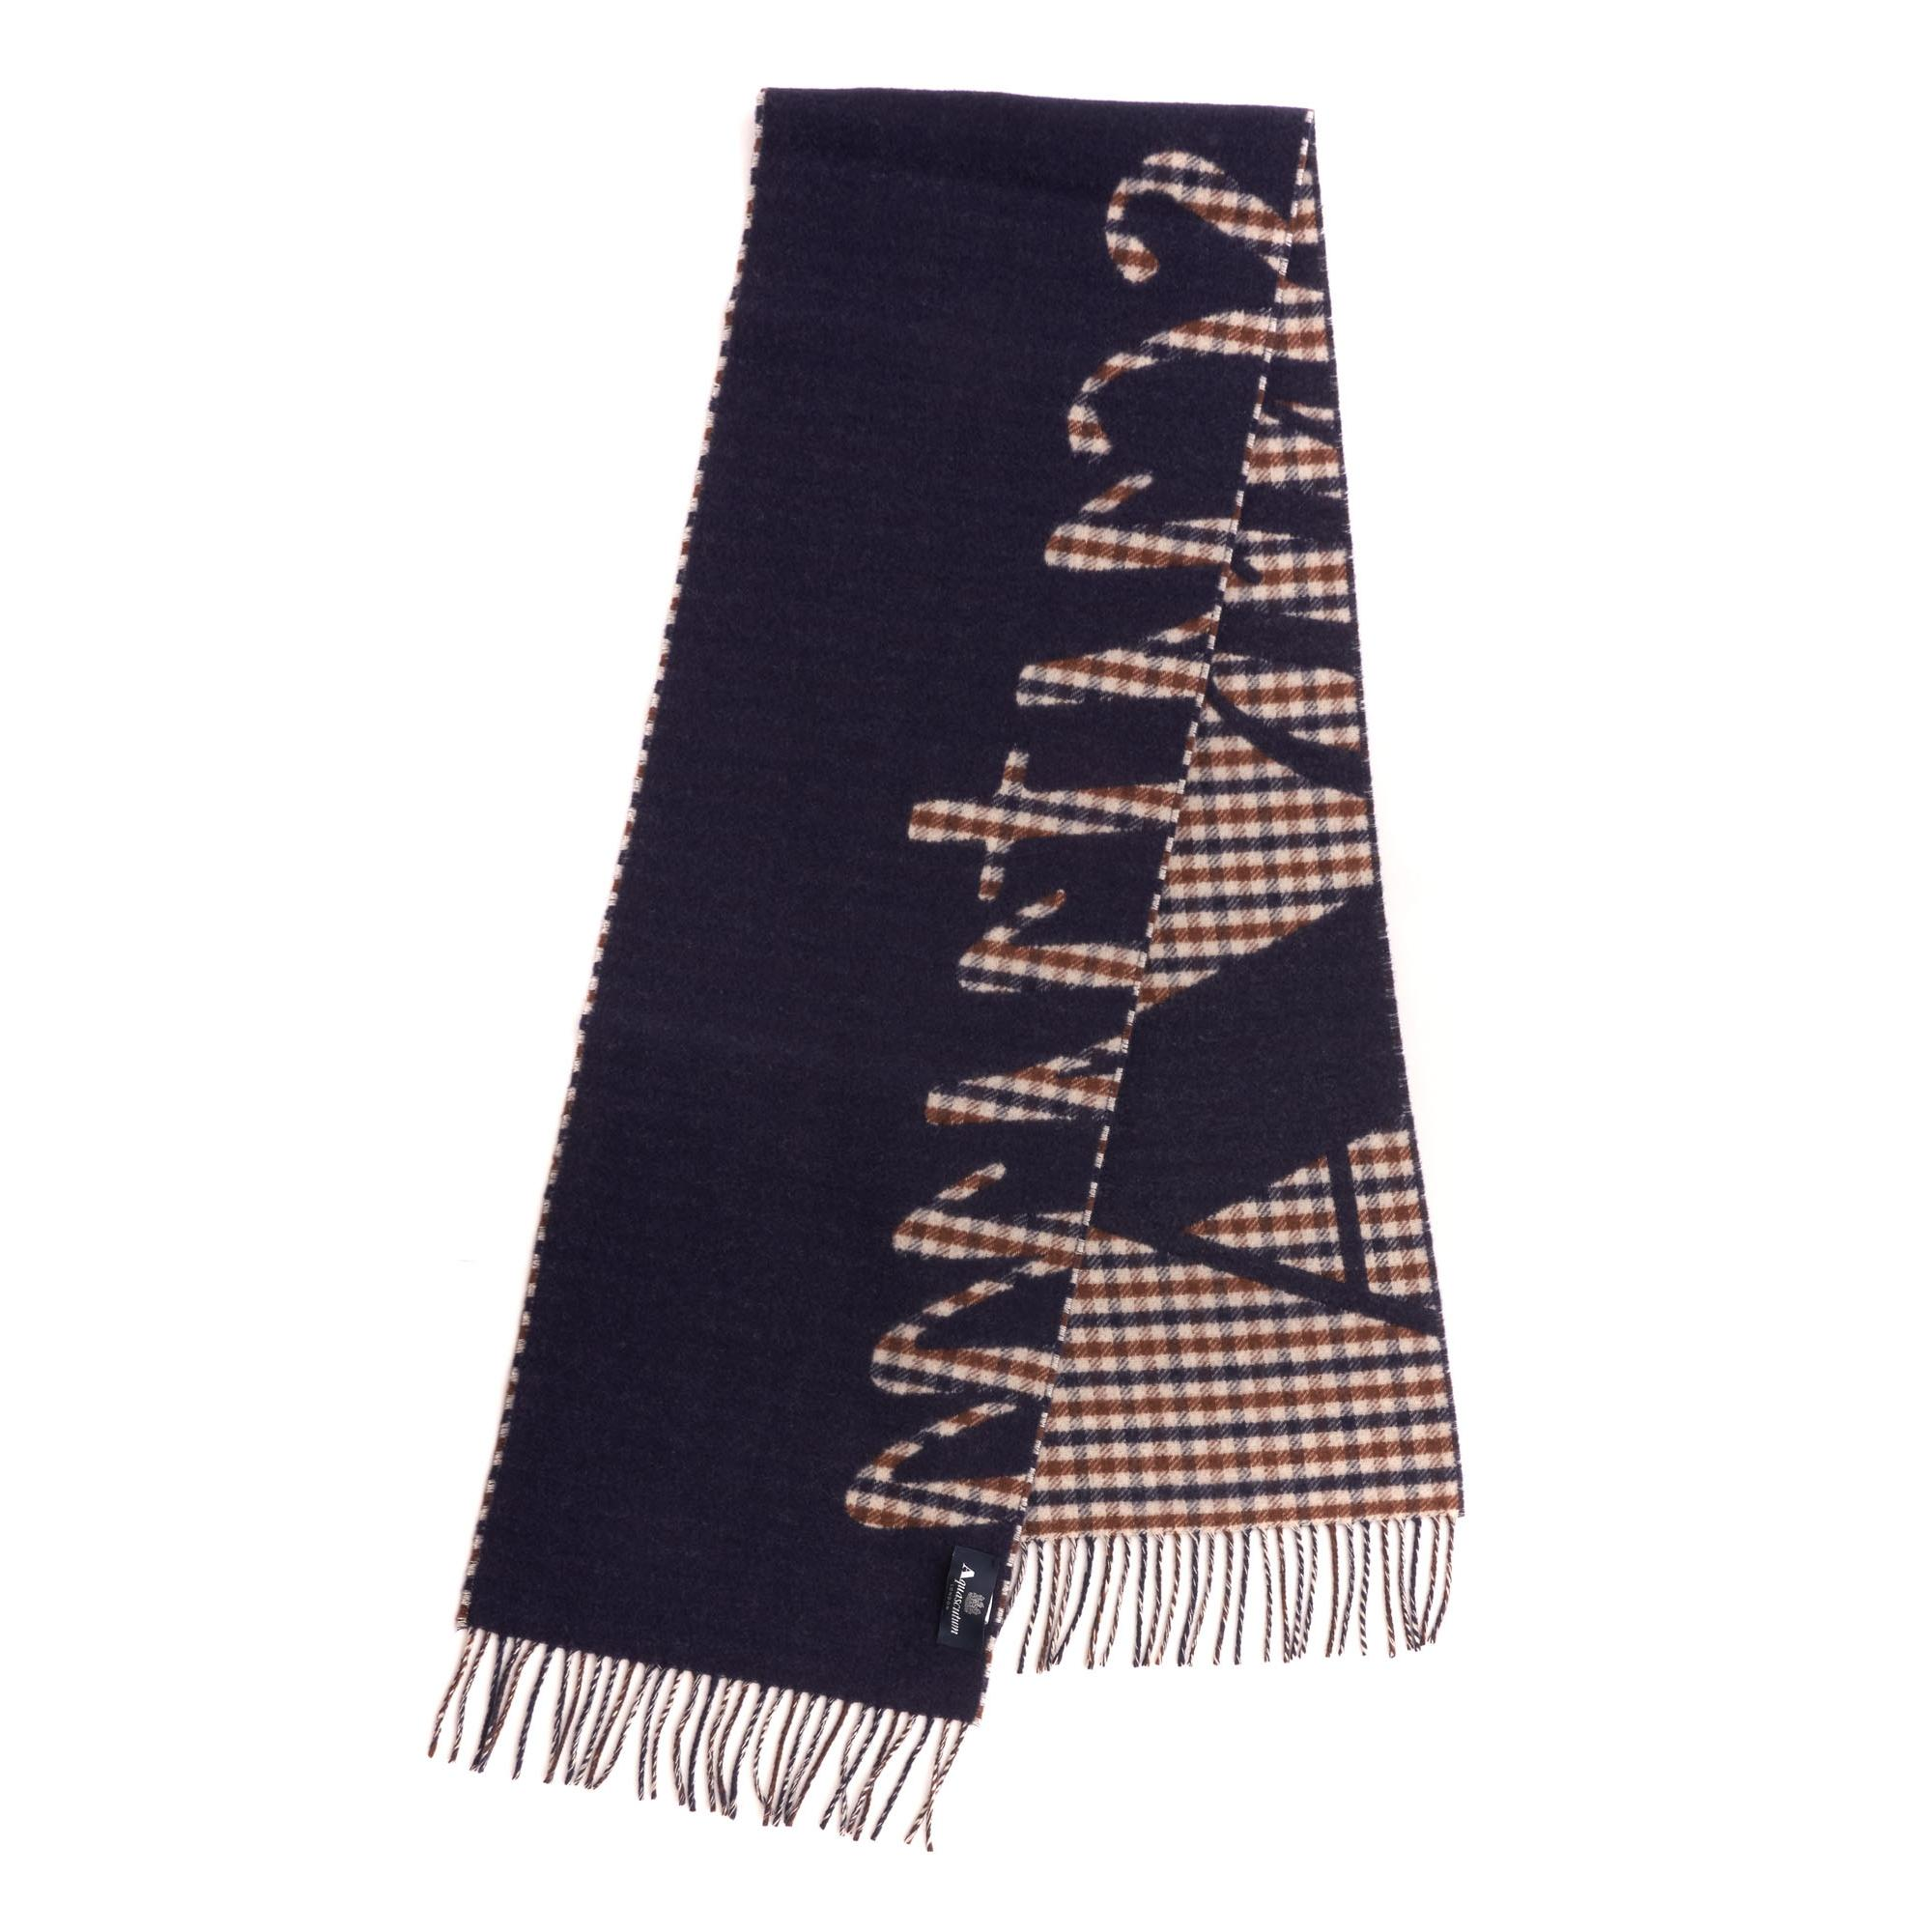 louis vuitton scarf sverige